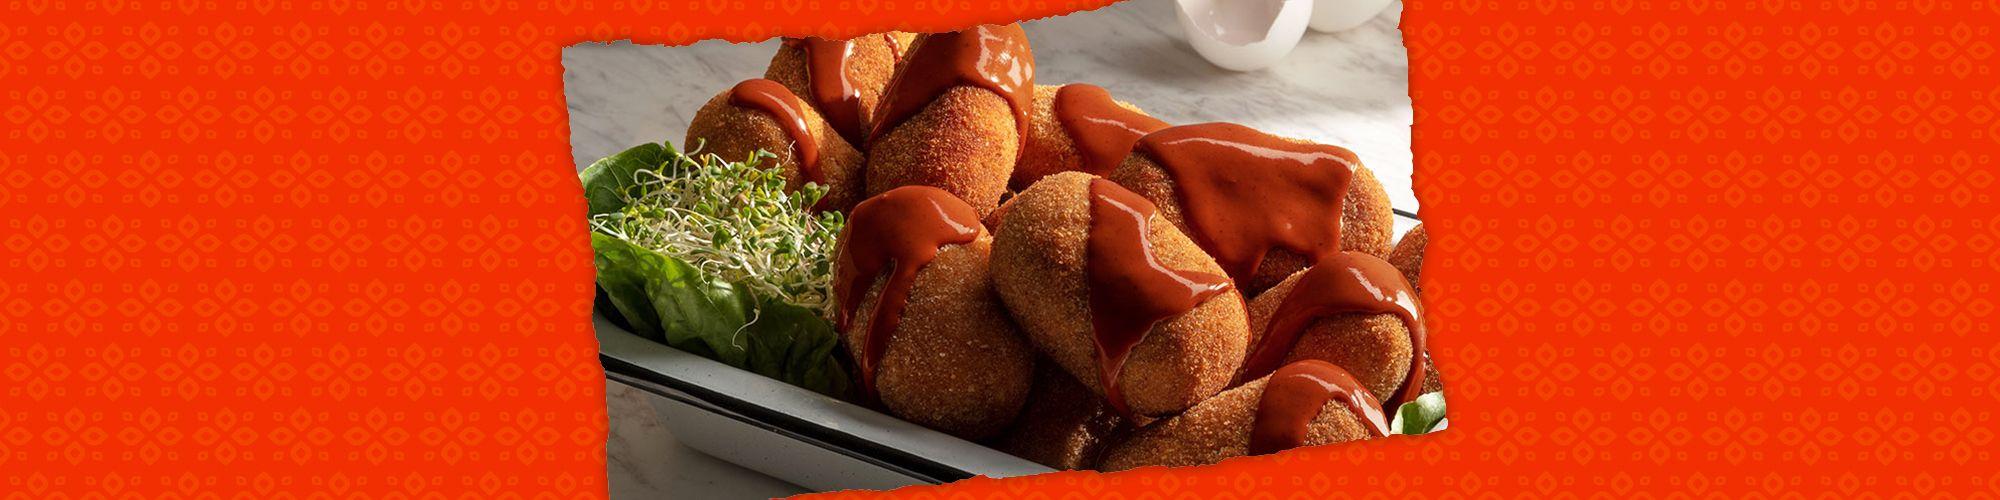 salsas pipian chicken banner